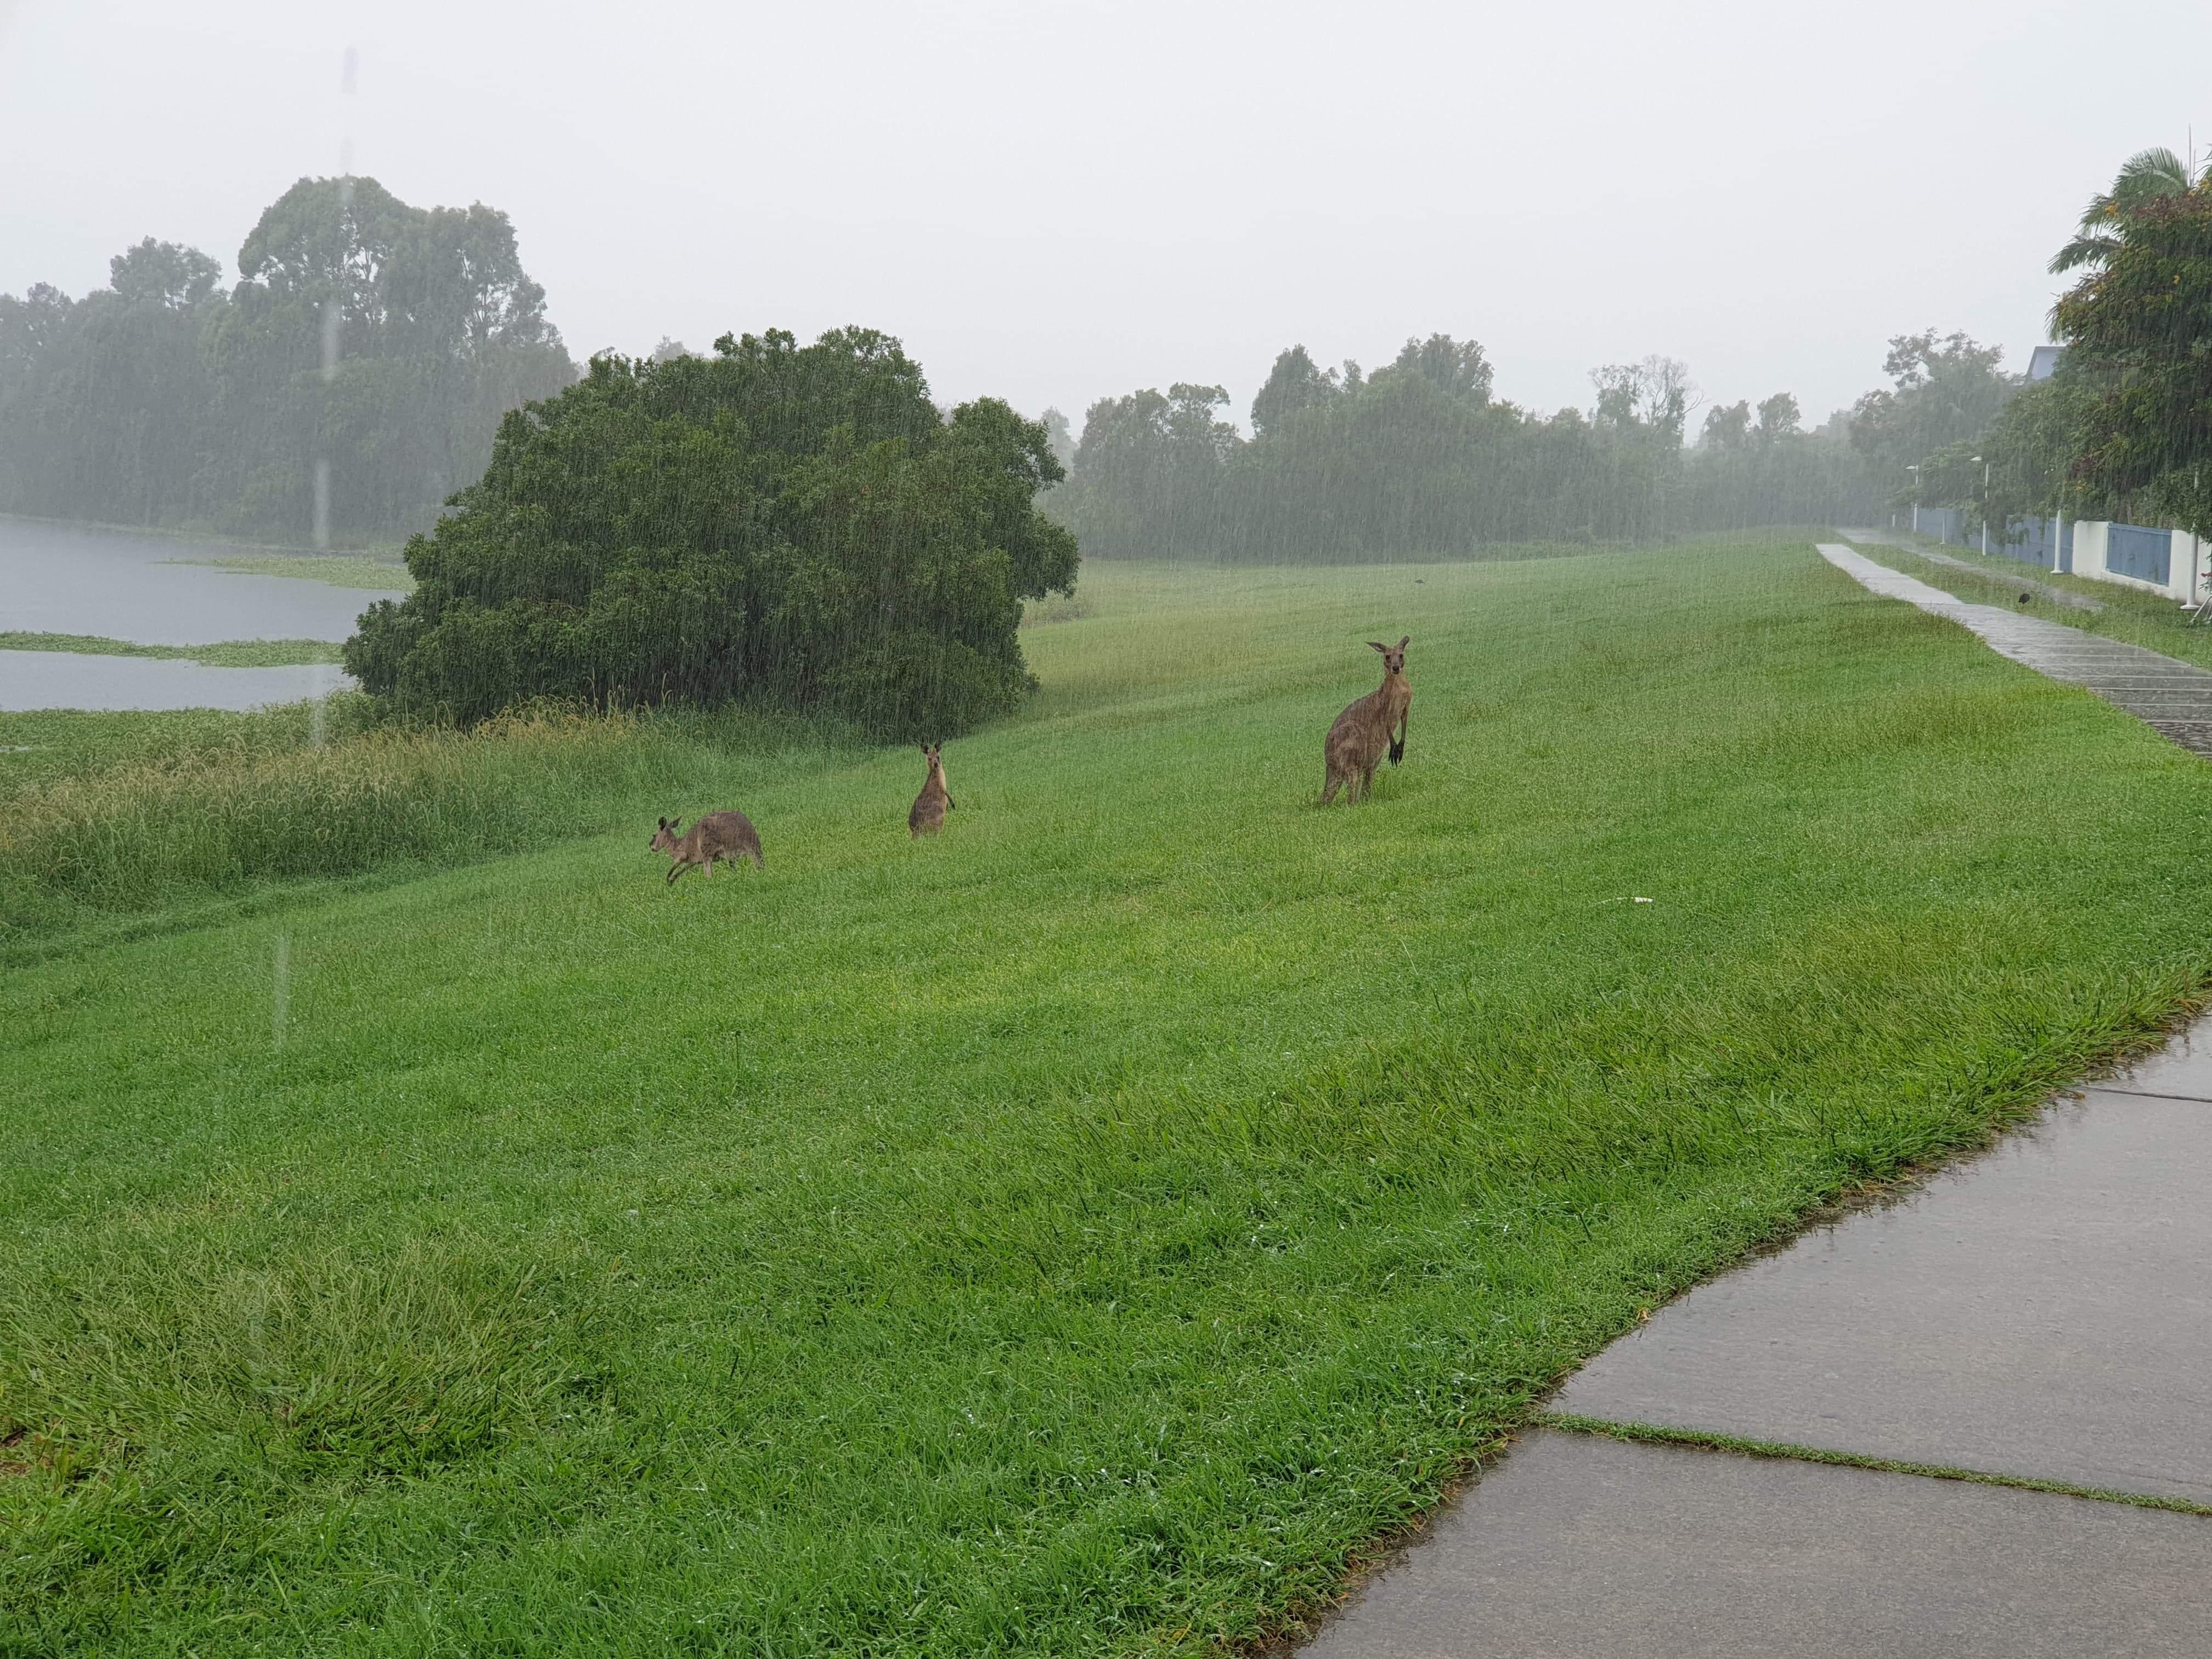 Kangaroos_in_best_australian_weather_near_UniCentral